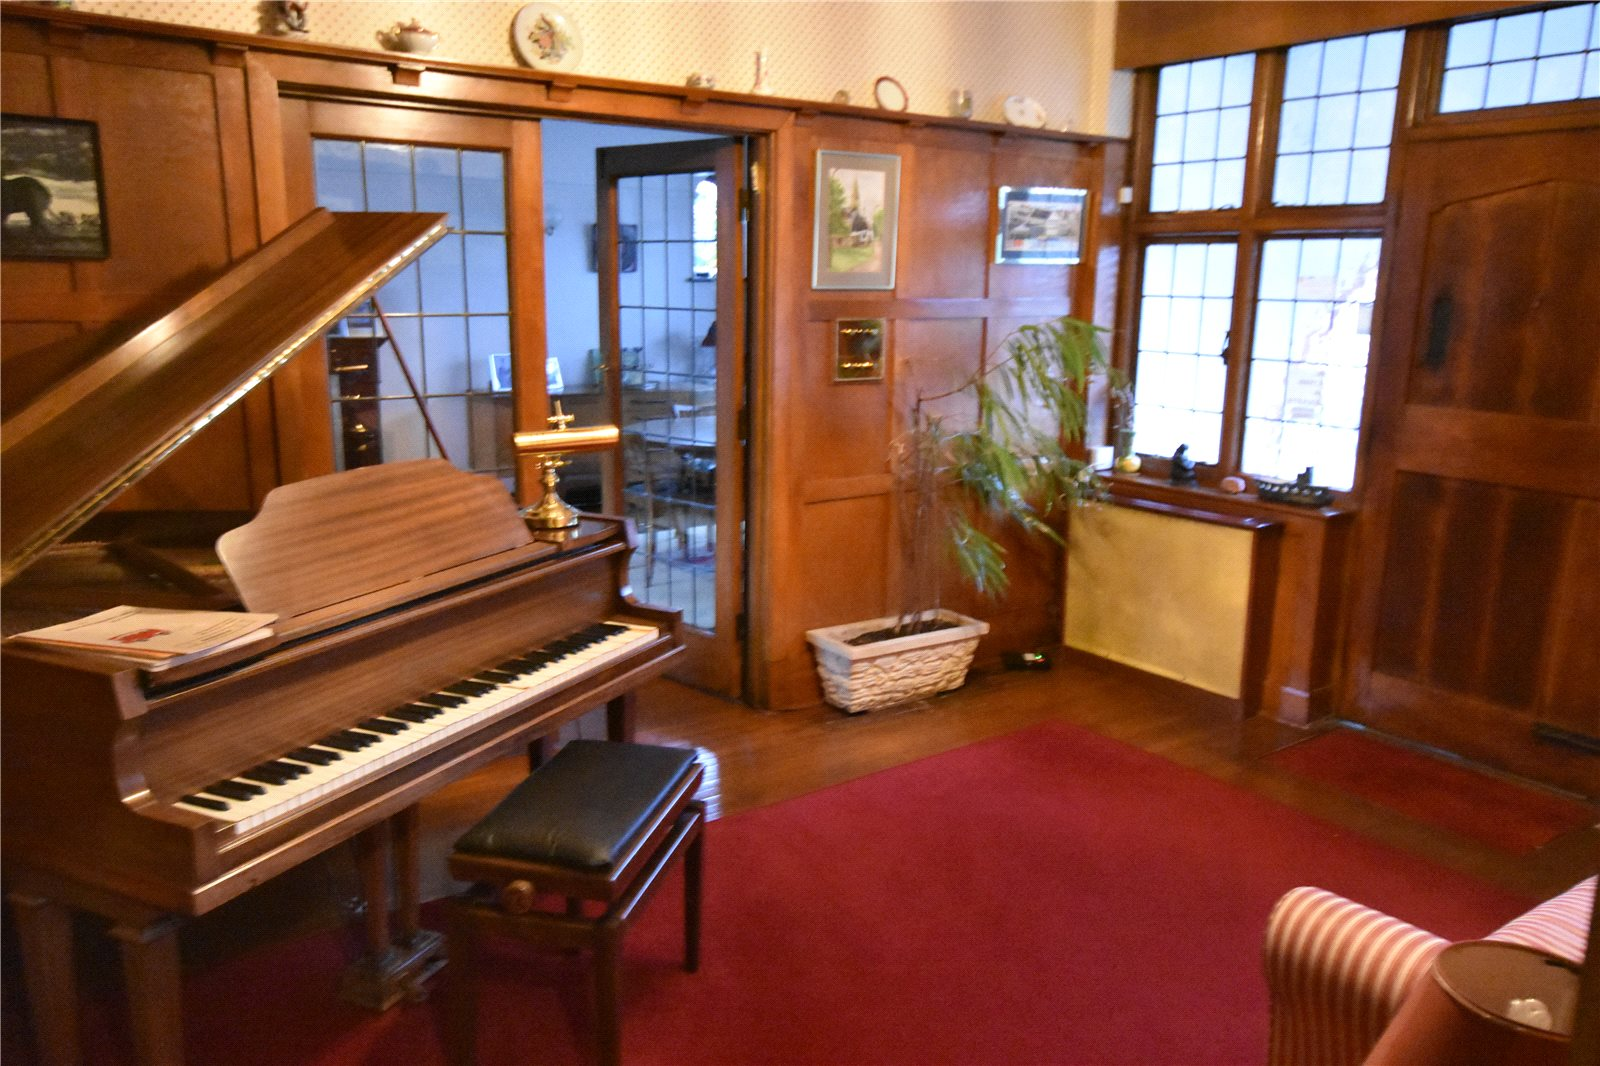 2 Bedroom Bungalow For Sale In Church Way Whetstone N20 London